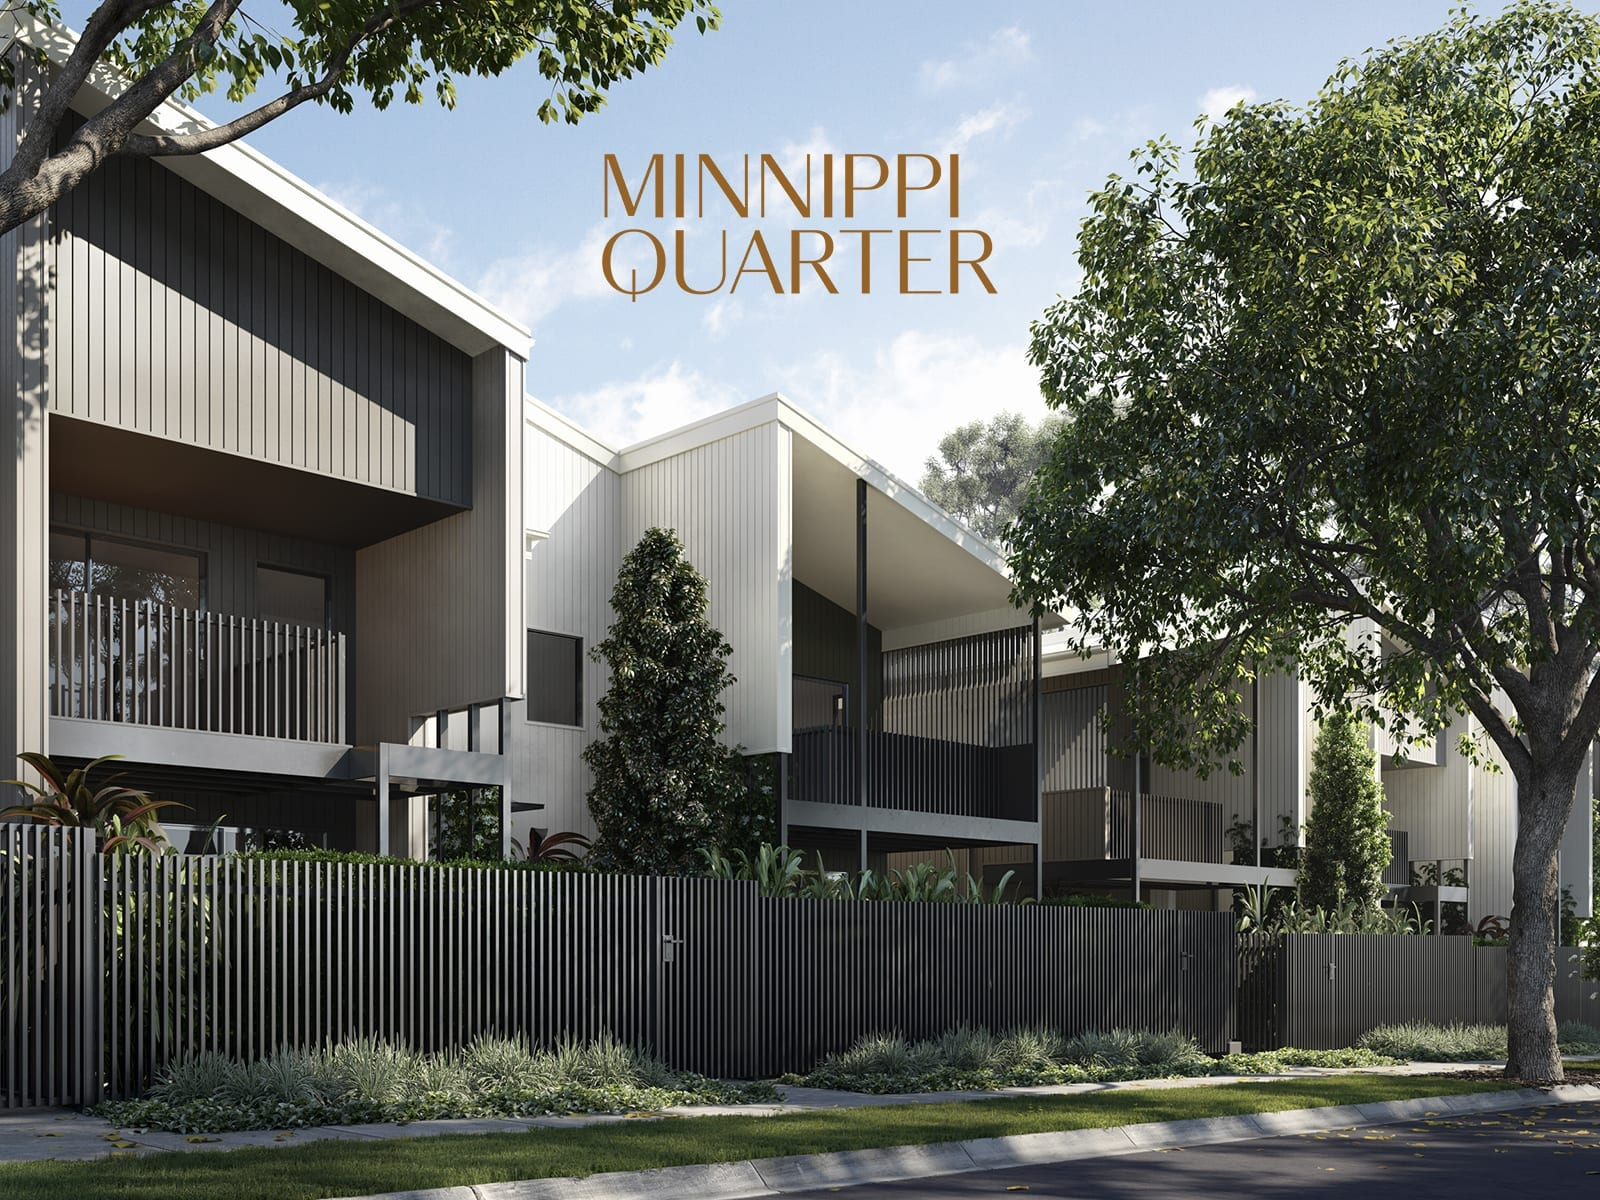 Minnippi Quarter